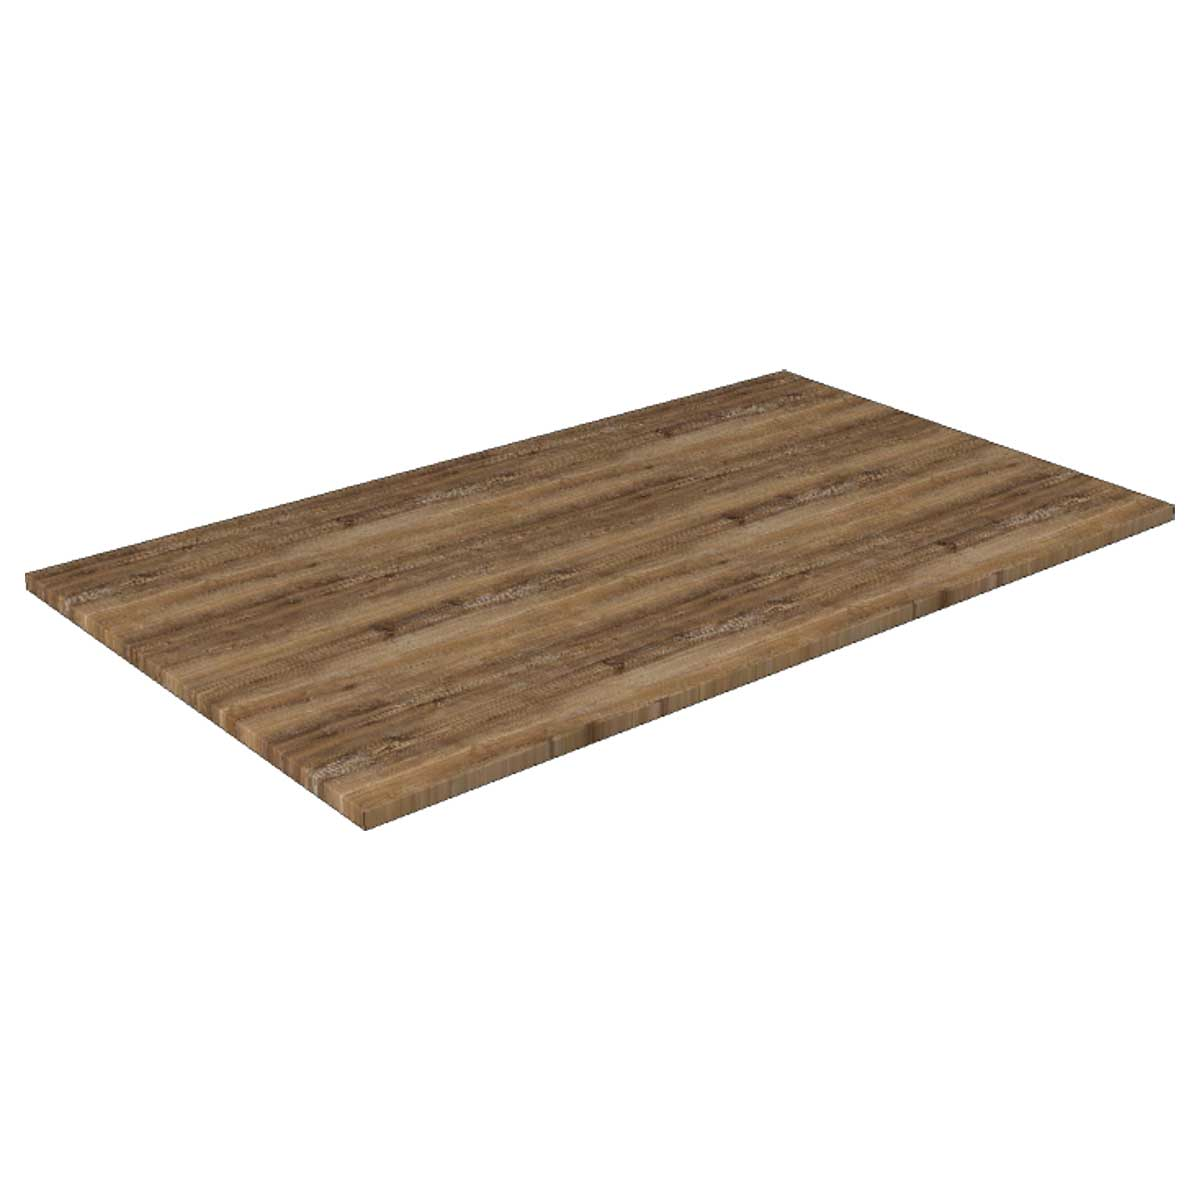 TICAM E120X70 4587 - https://www.werzalit.com/en/product/table-top-cambium-e-70x60cm-board-thickness-39cm-decor-bruges/